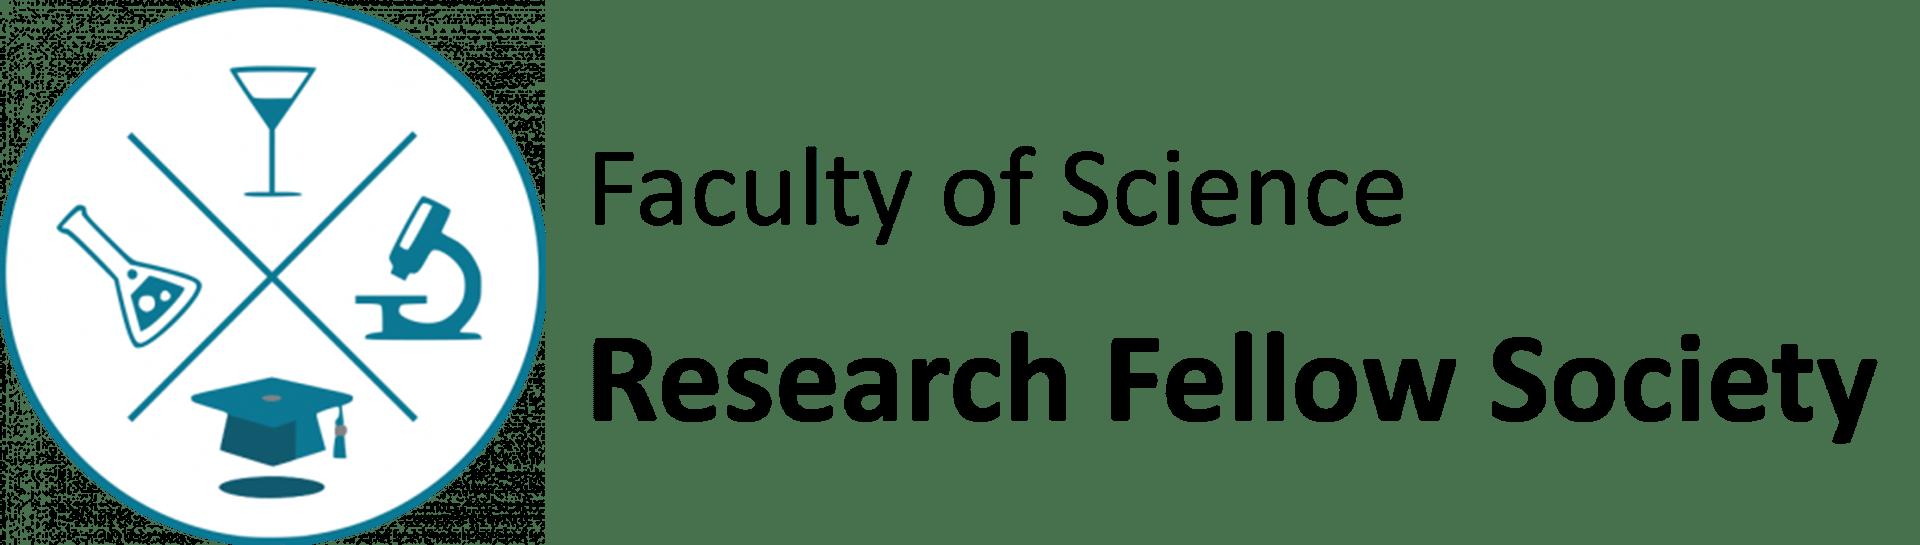 FoS Research Fellow Society